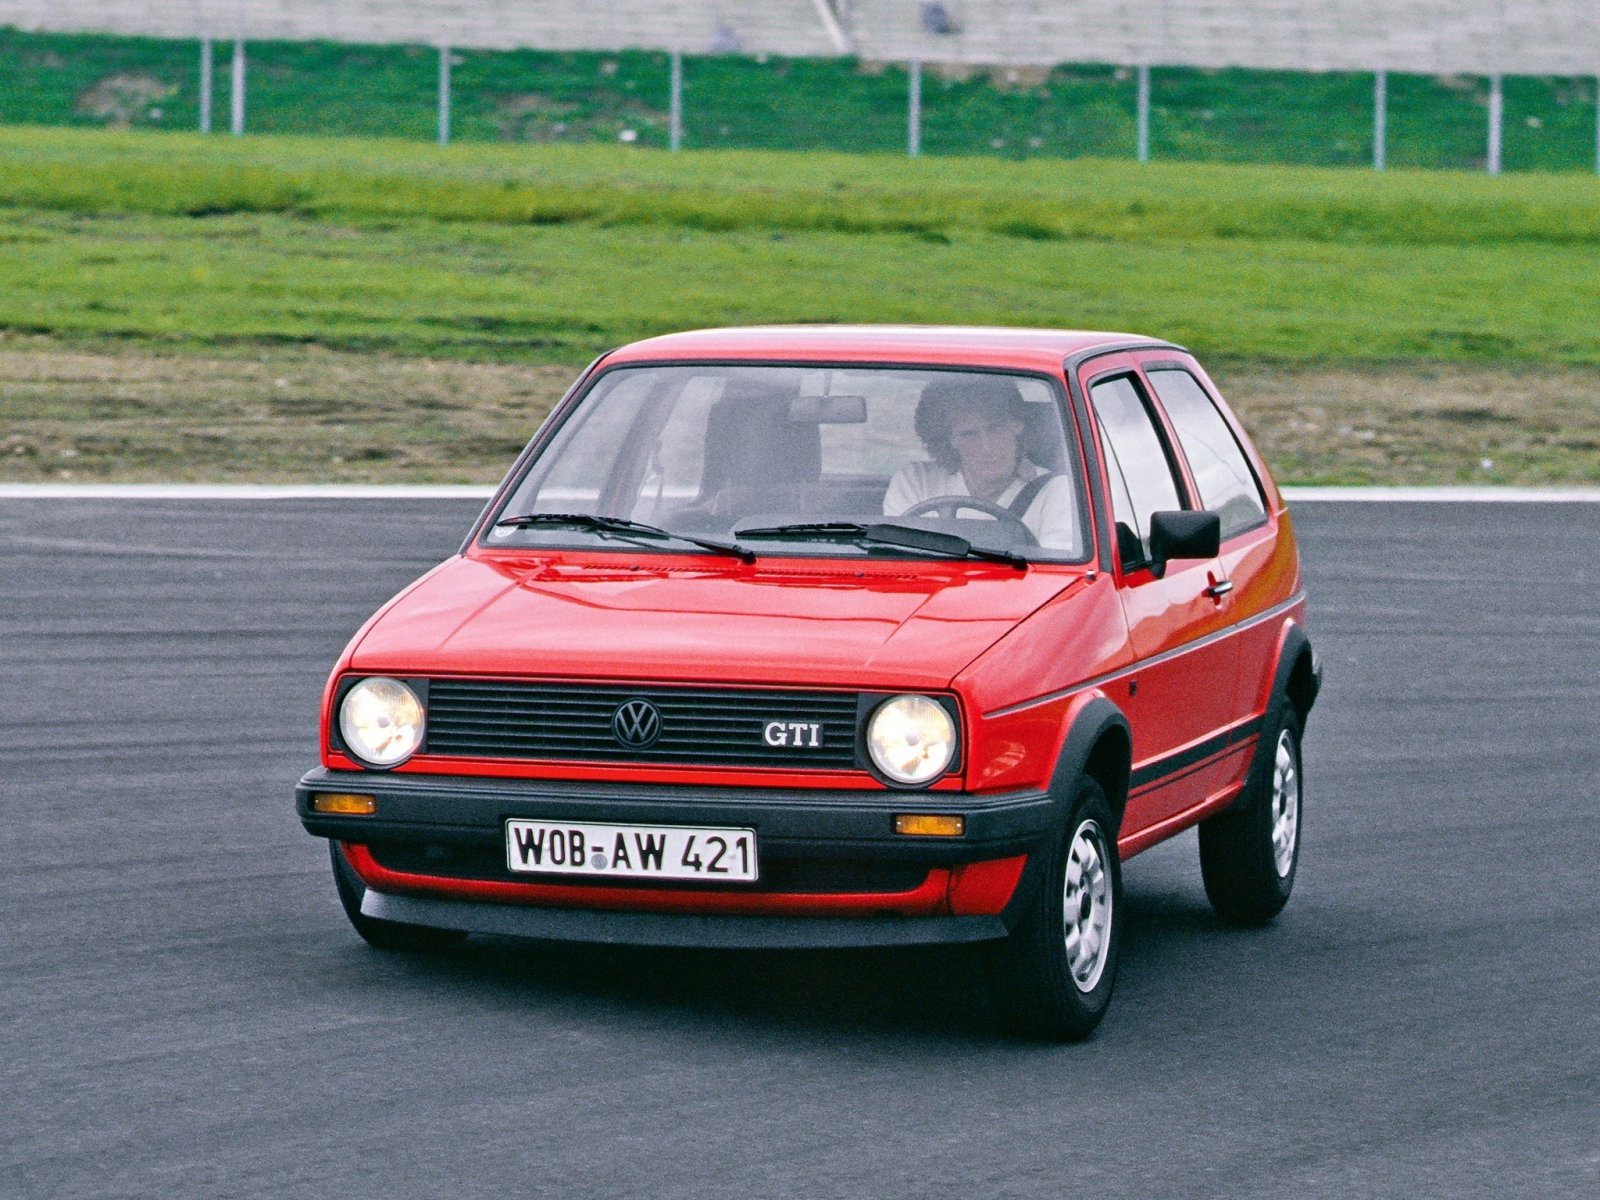 Volkswagen (Фольксваген) Golf 1983-1986 г.